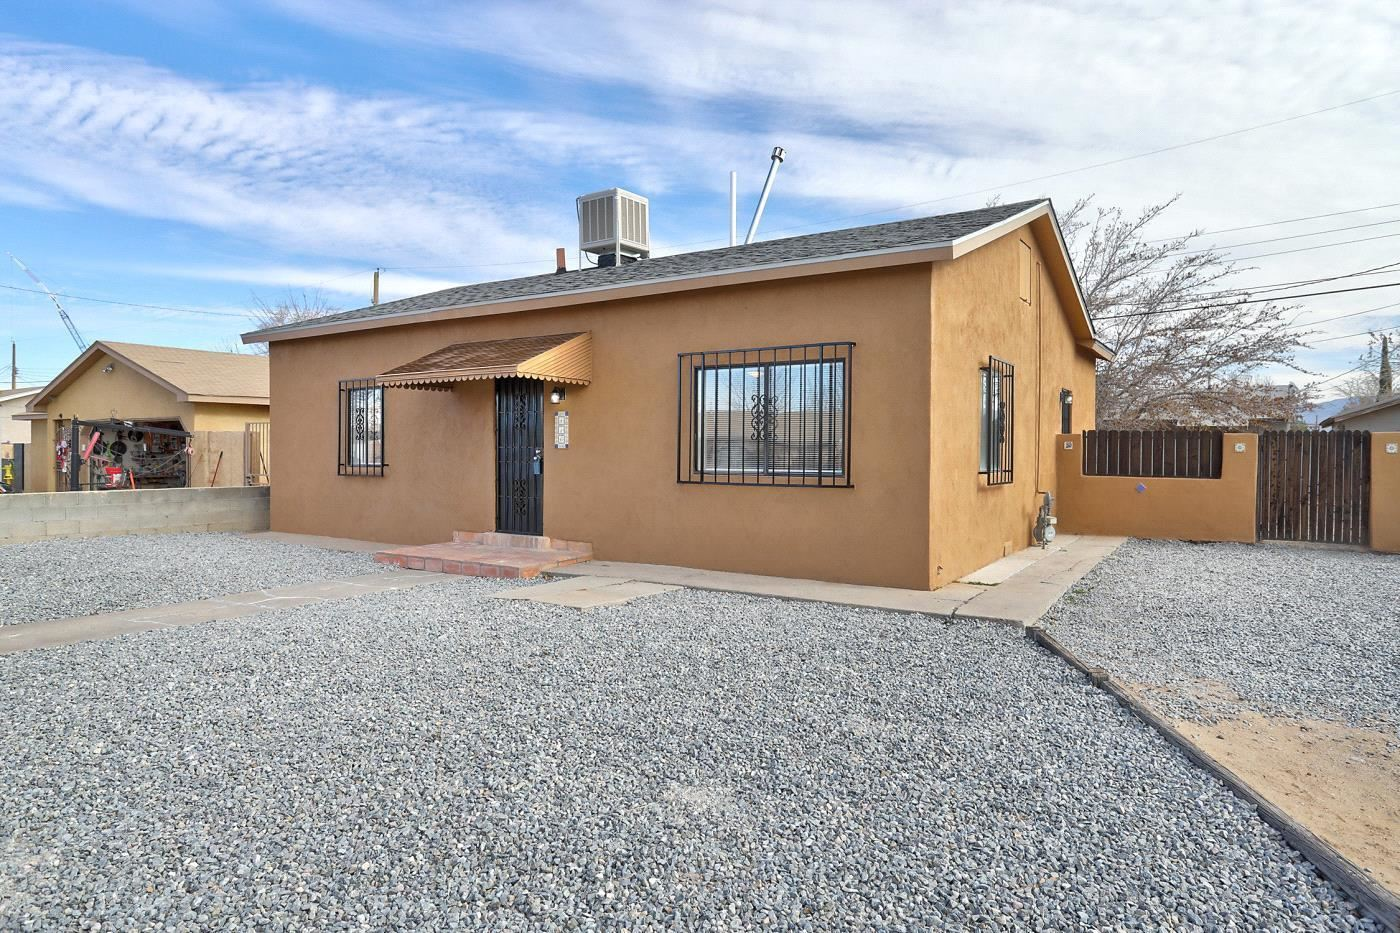 Photo of 416 59TH Street NW, Albuquerque, NM 87105 (MLS # 985256)